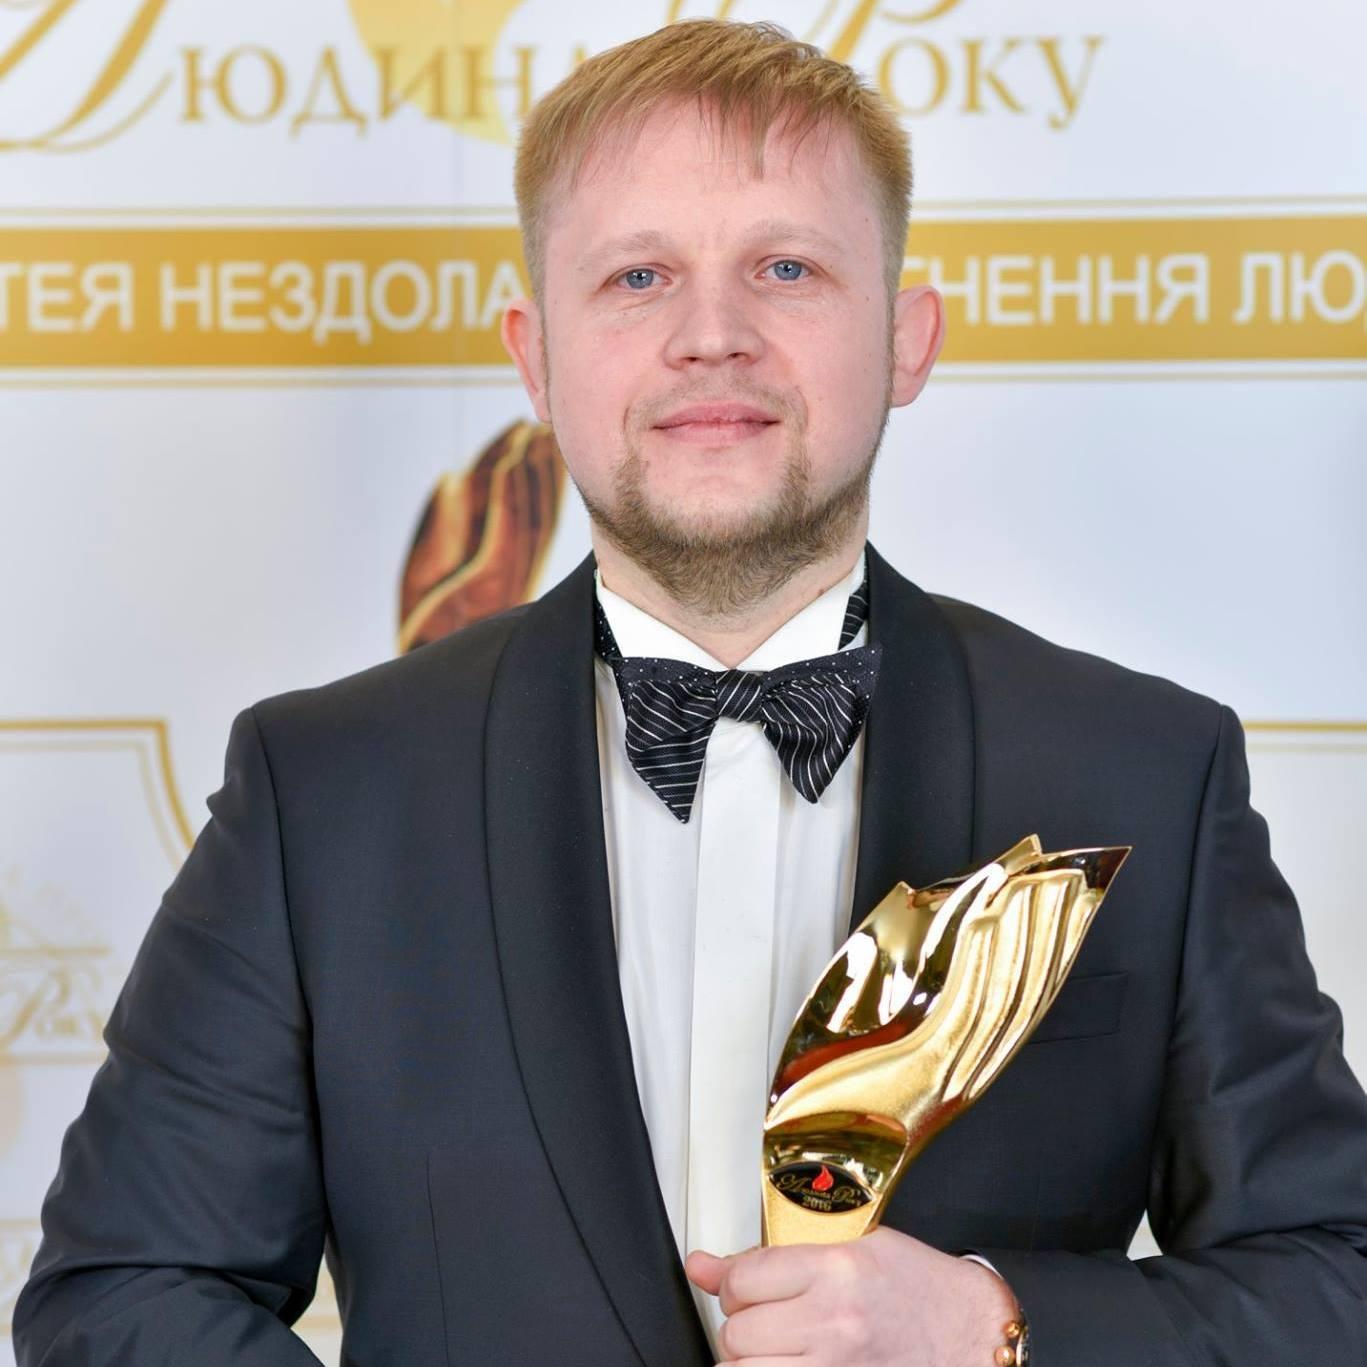 Дмитрий плавник красноярск фото подушку можно